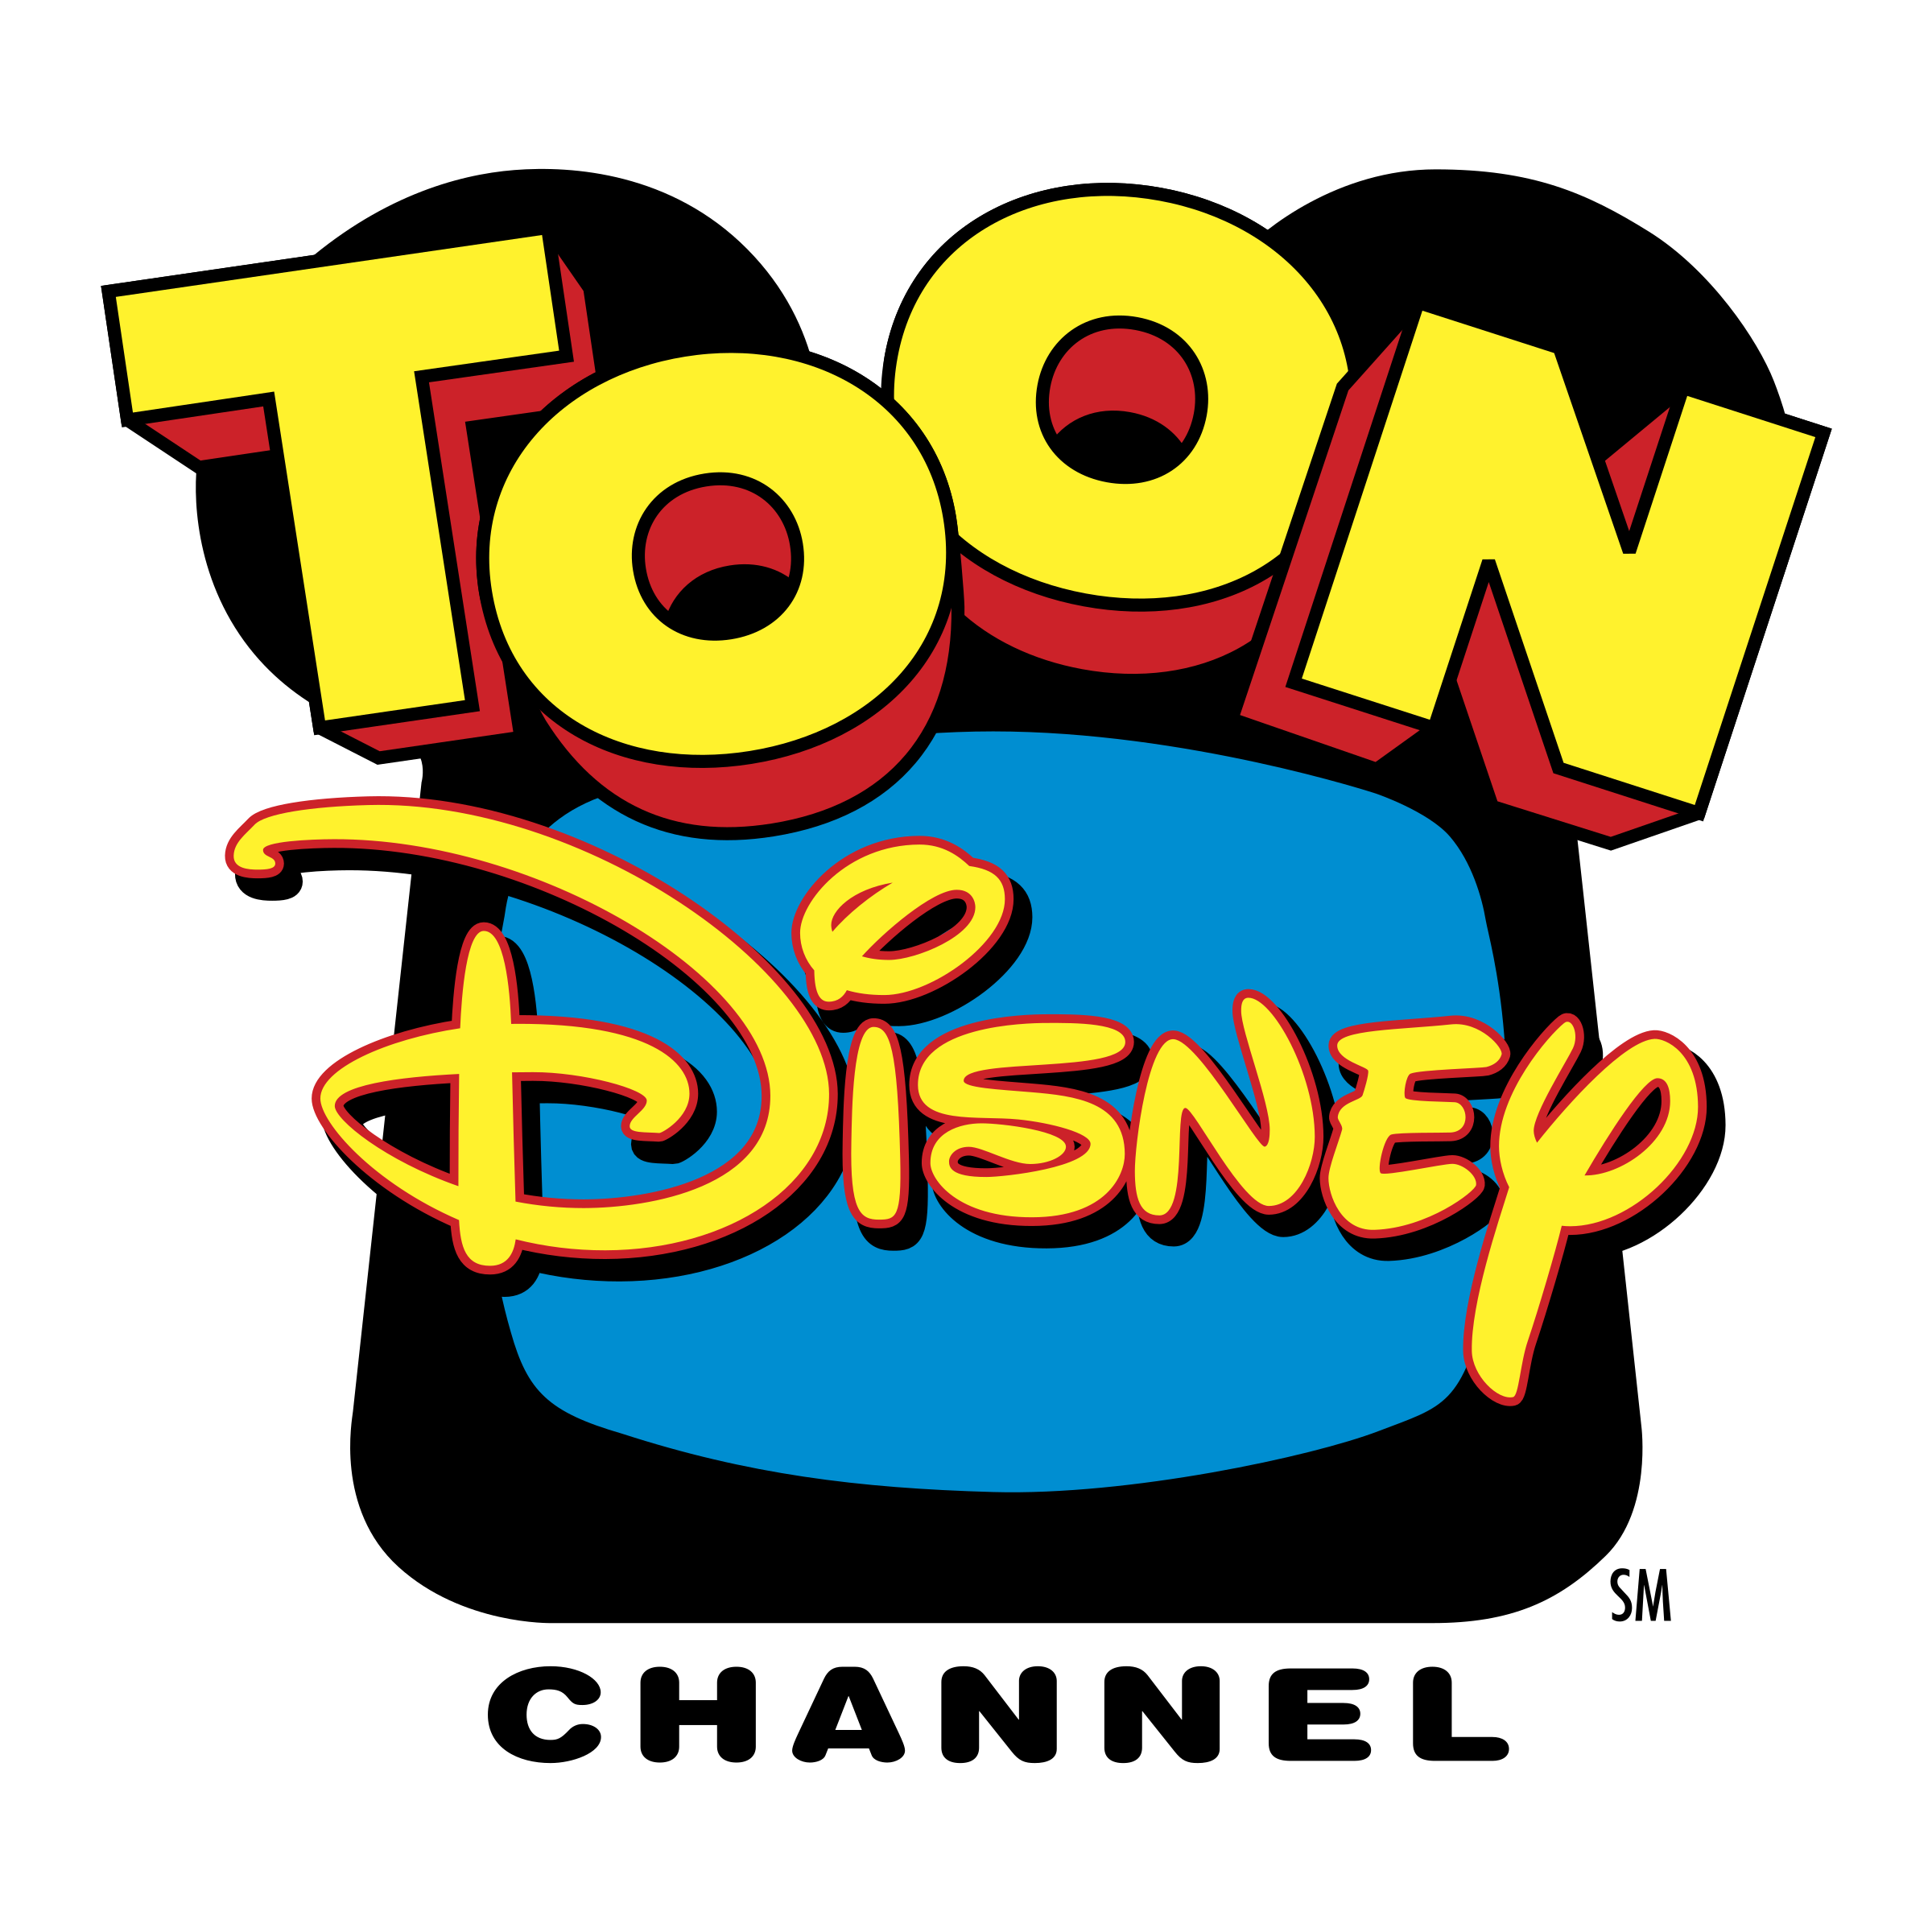 toon disney channel logo png transparent svg vector freebie supply rh freebiesupply com disney free vector download disney logo vector download